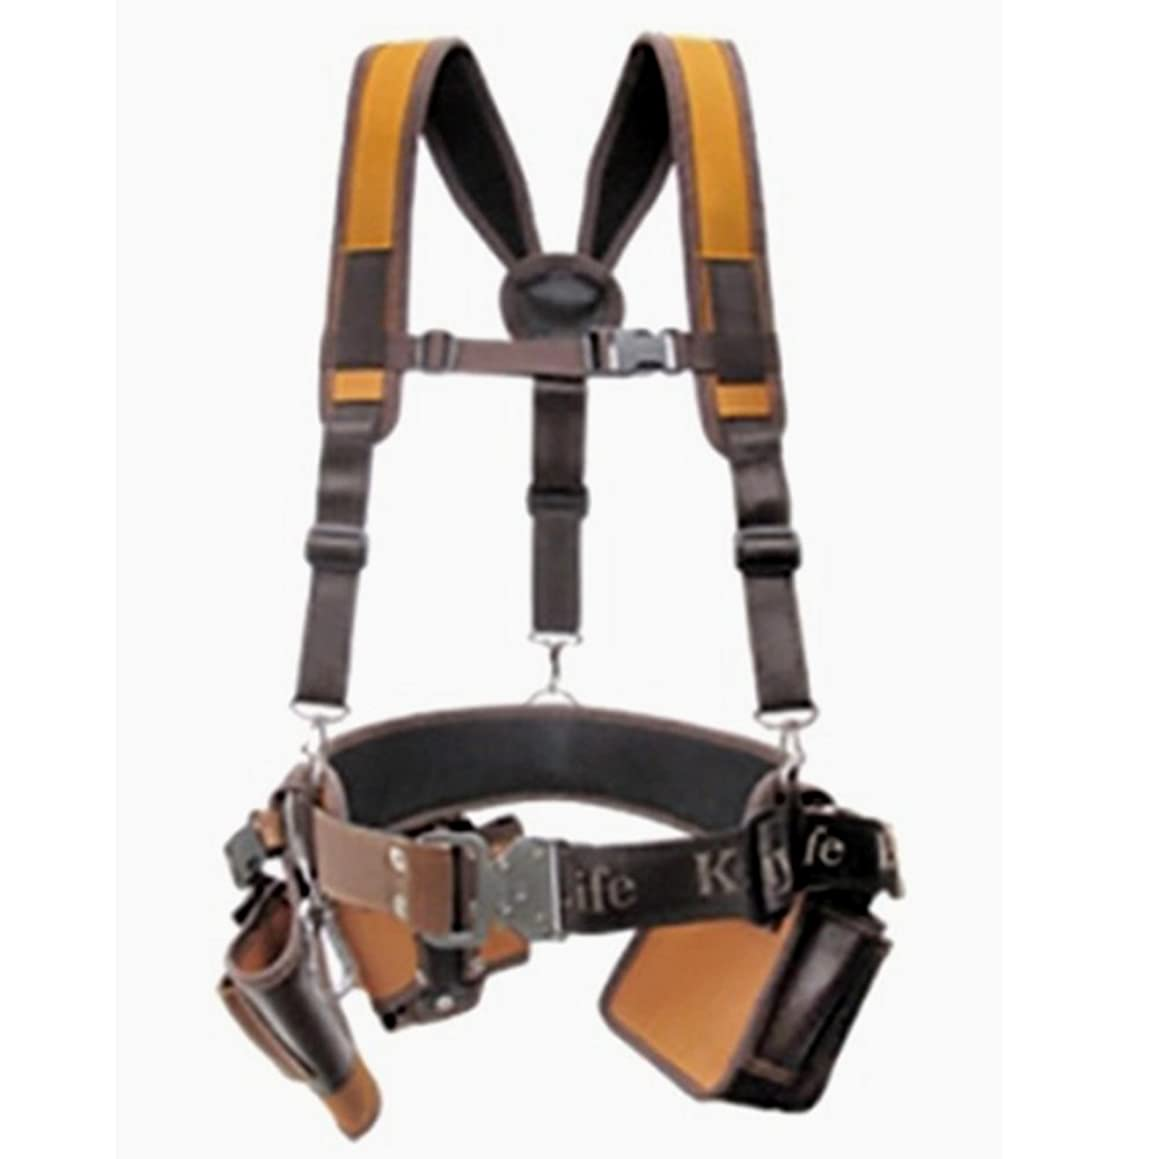 Kaya Life fabirc multi tool holders- Suspender+ Wide belt + Drill house+ Multipurpose tool housing+ Nail pocket 5pcs set